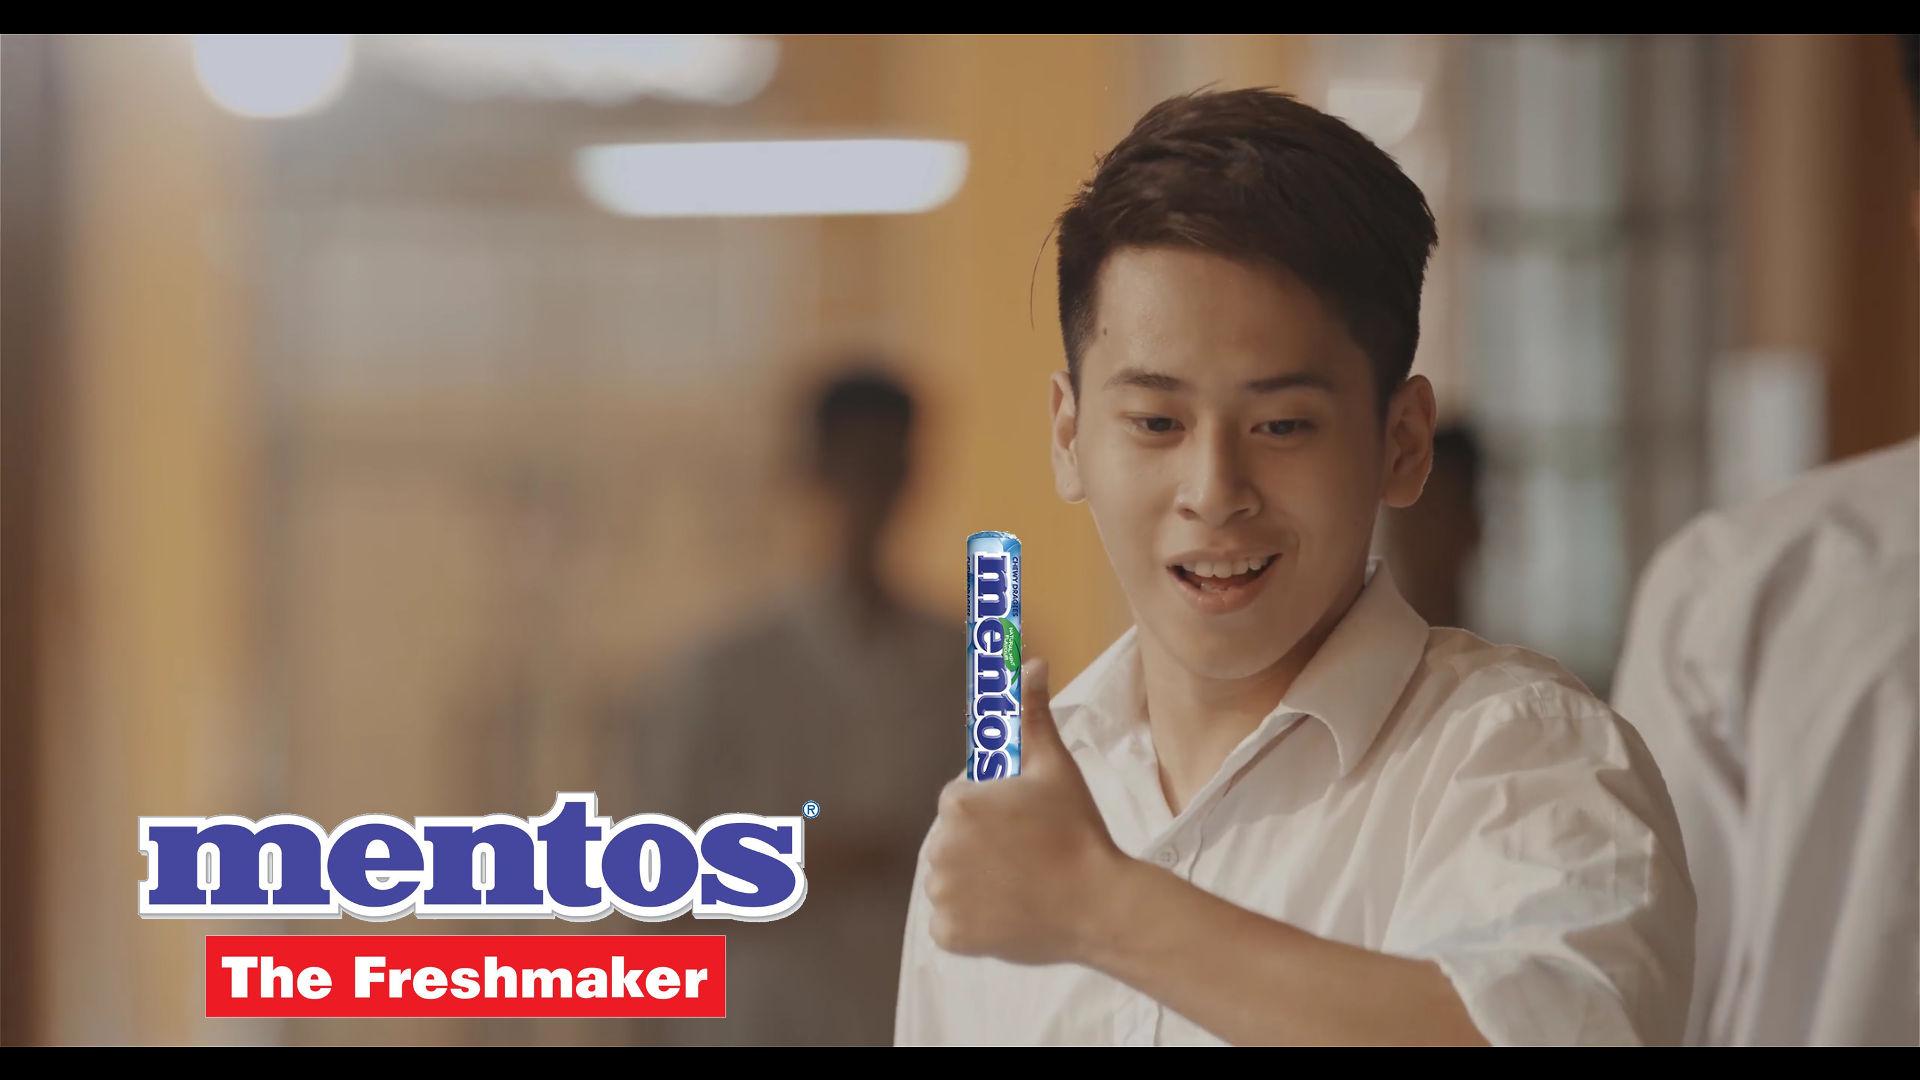 Mentos! The Freshmaker!